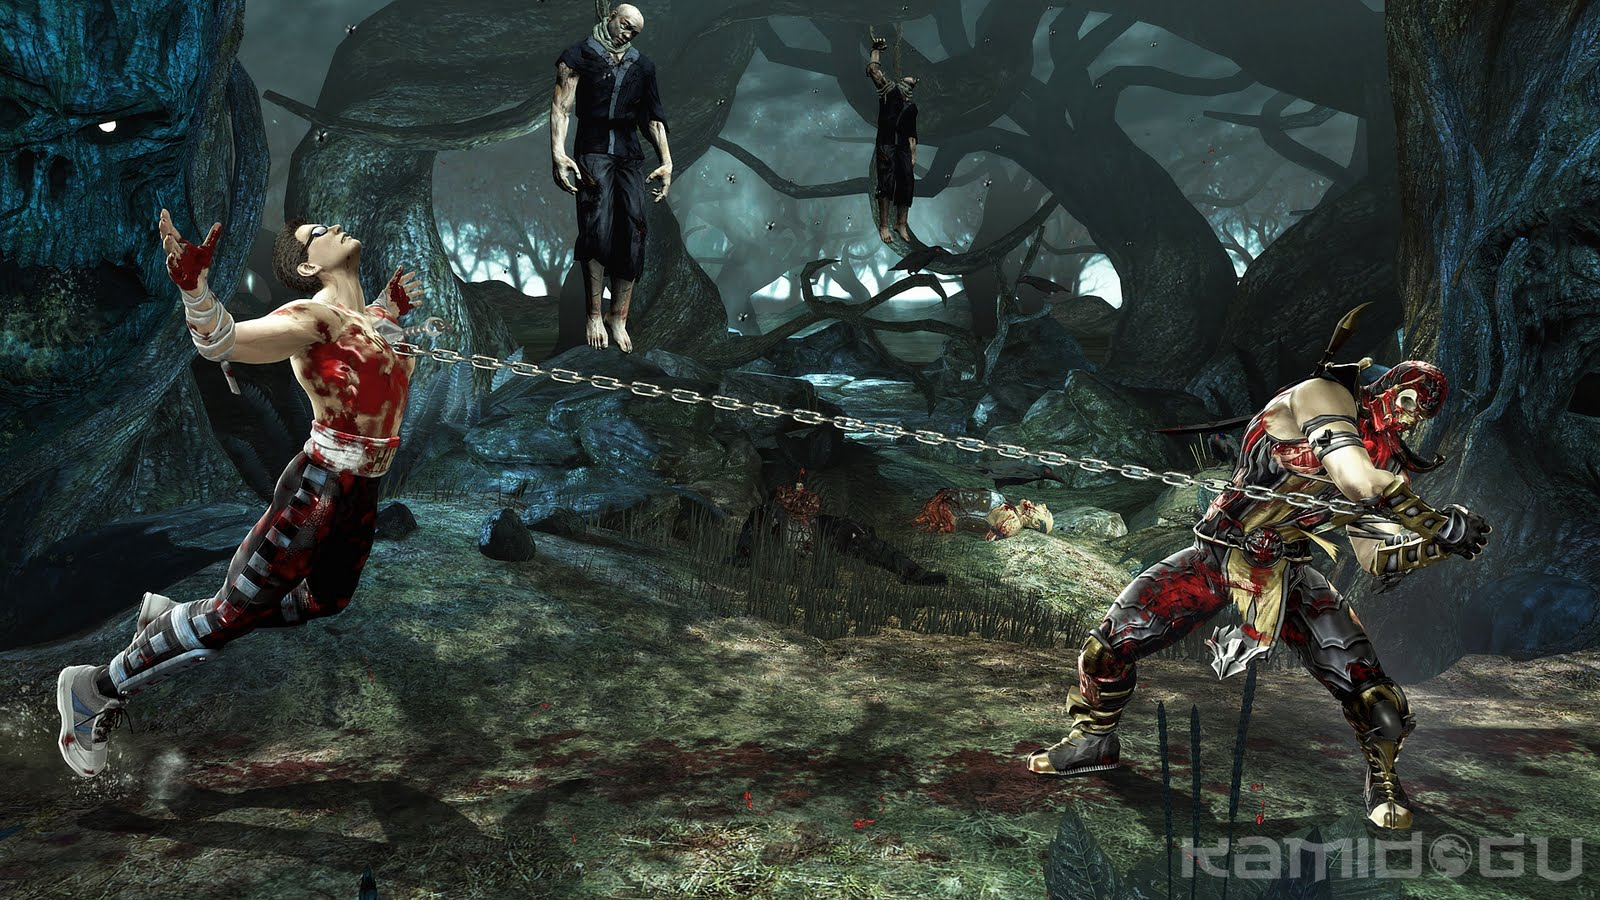 Mortal Kombat 9 [Análise] Mortal+kombat+9